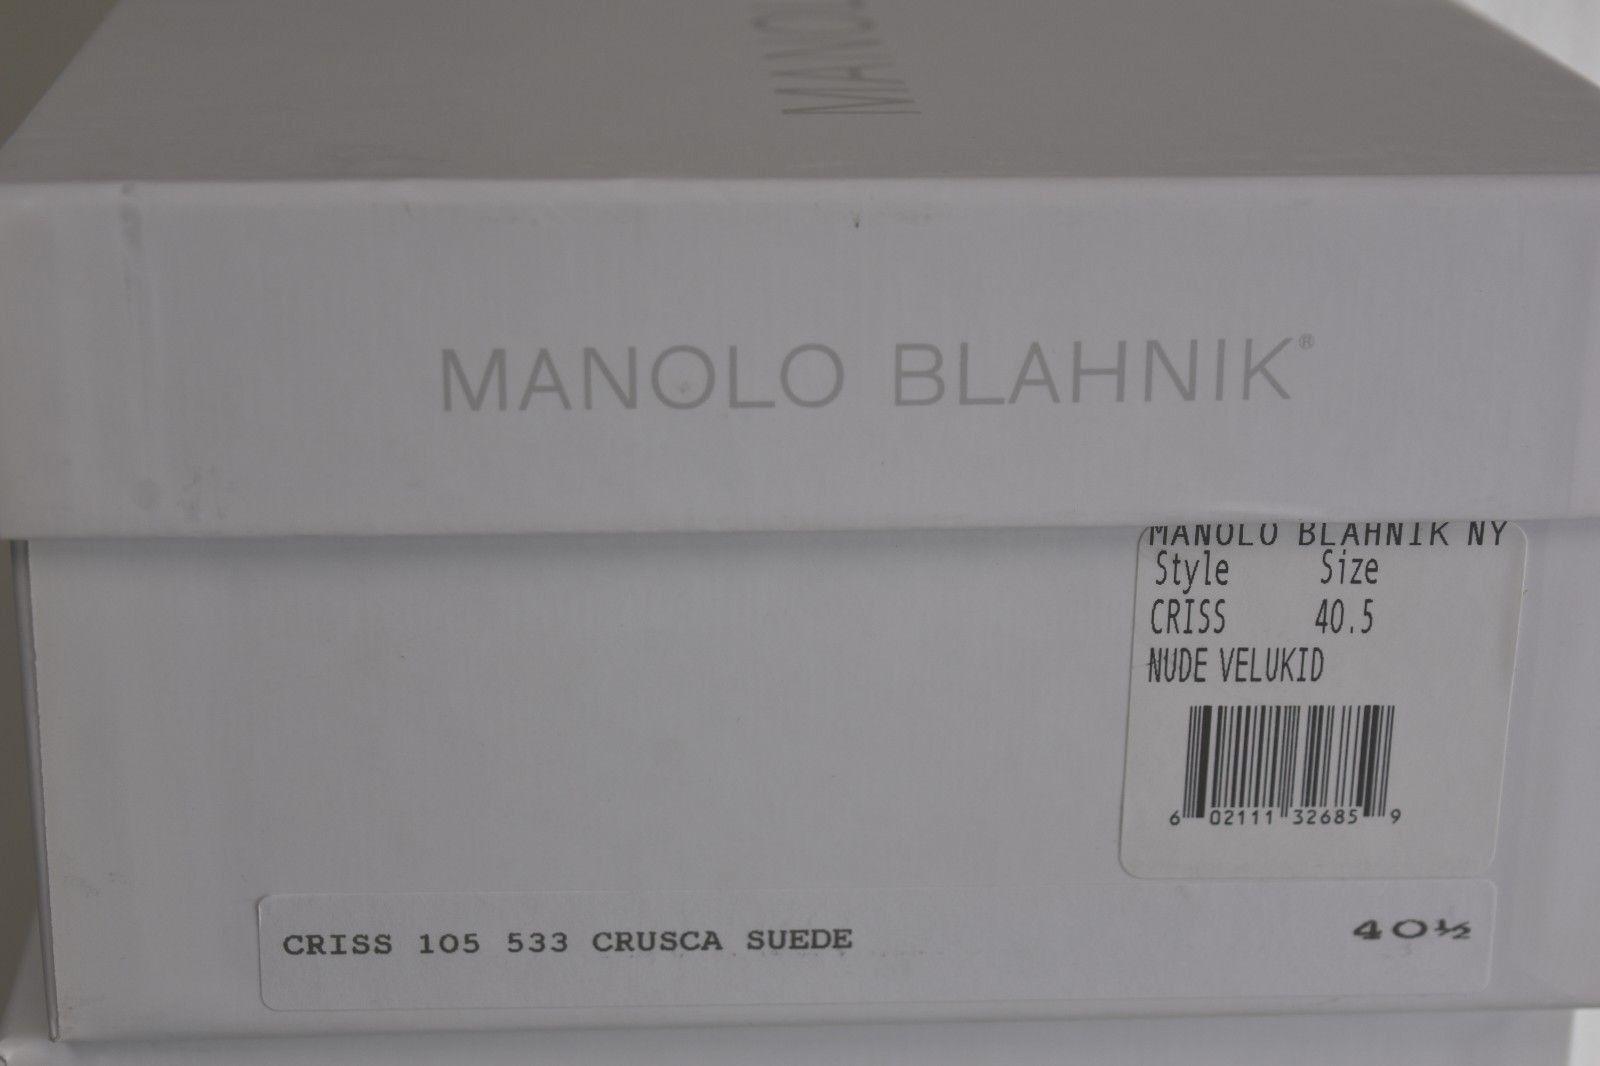 745 NEW Manolo Blahnik CRISS 105 Suede Suede Suede NUDE Beige Sandals schuhe 36 39 40 40.5 ba9d1f